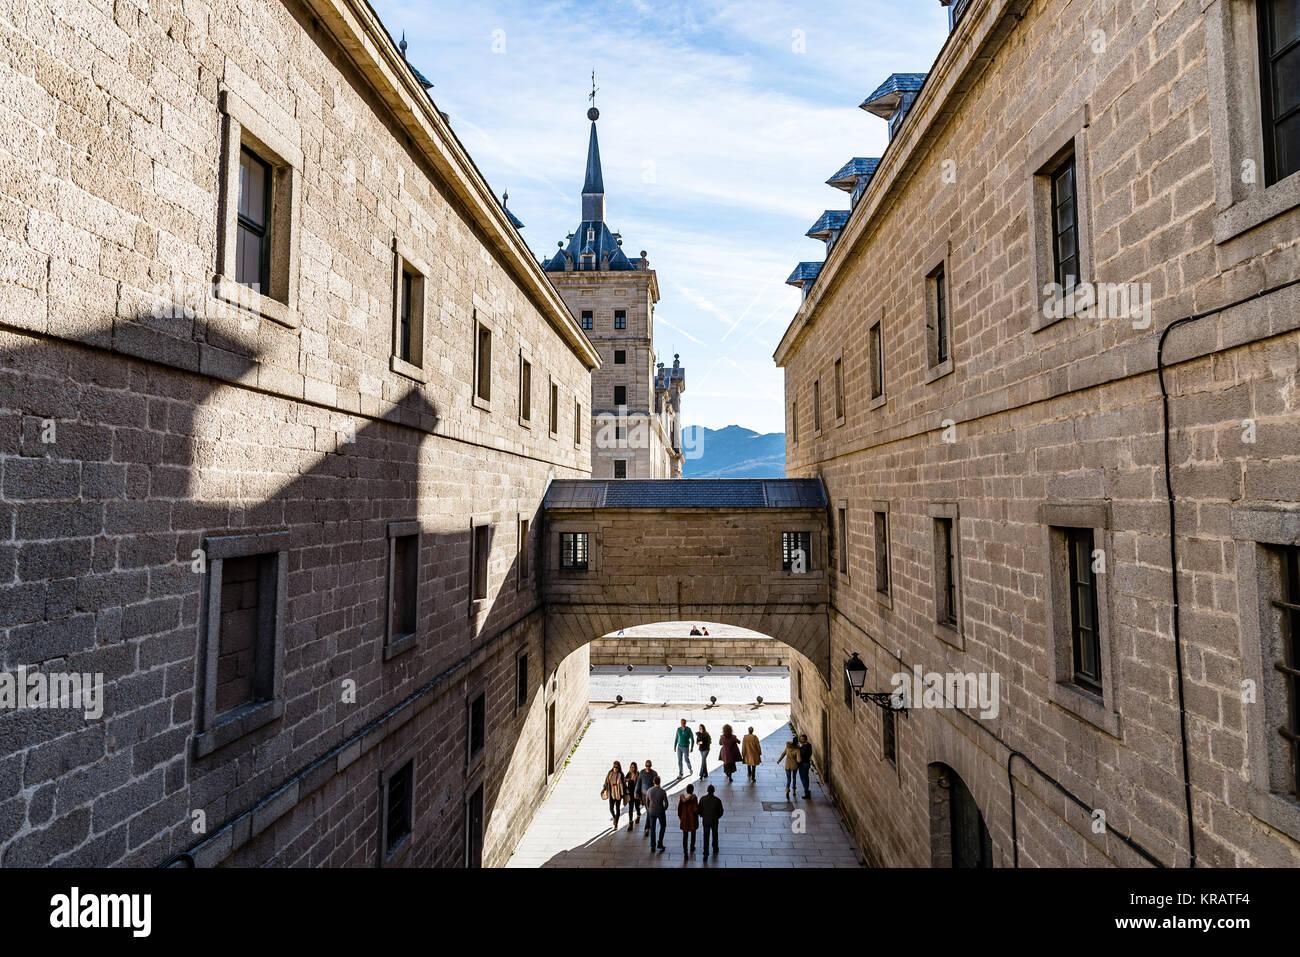 Outdoor view of Monastery of El Escorial Stock Photo